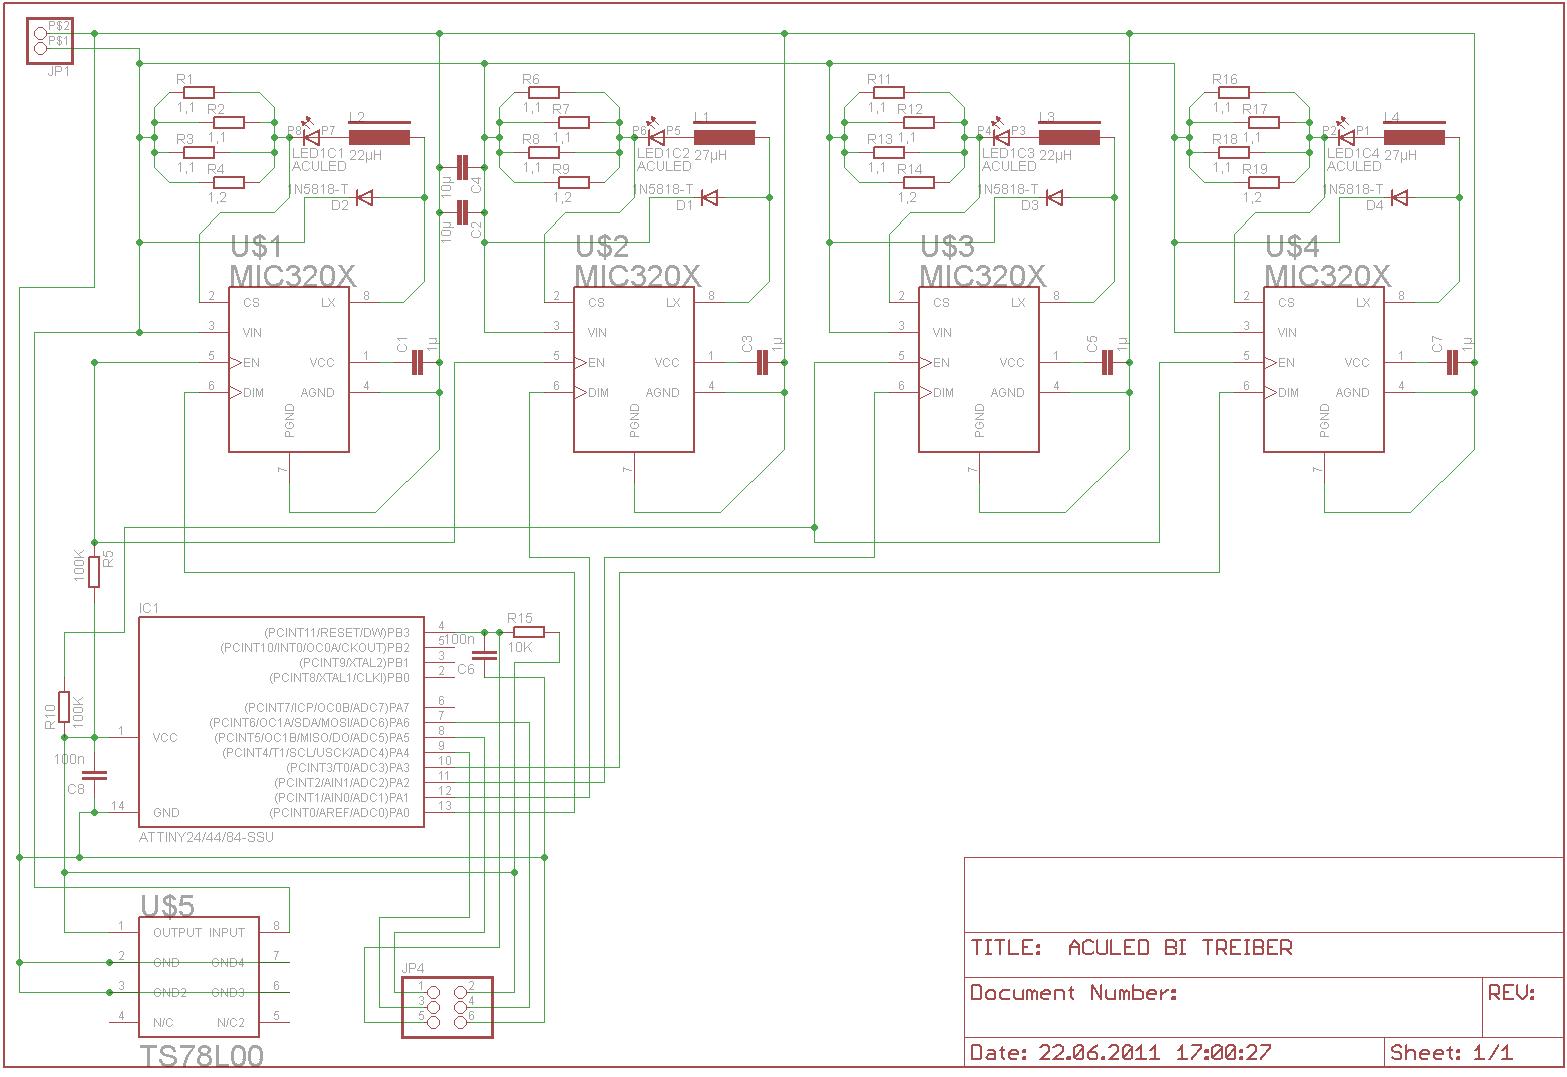 Problem mit LED Treiber nach LED-Treiber.de - Mikrocontroller.net